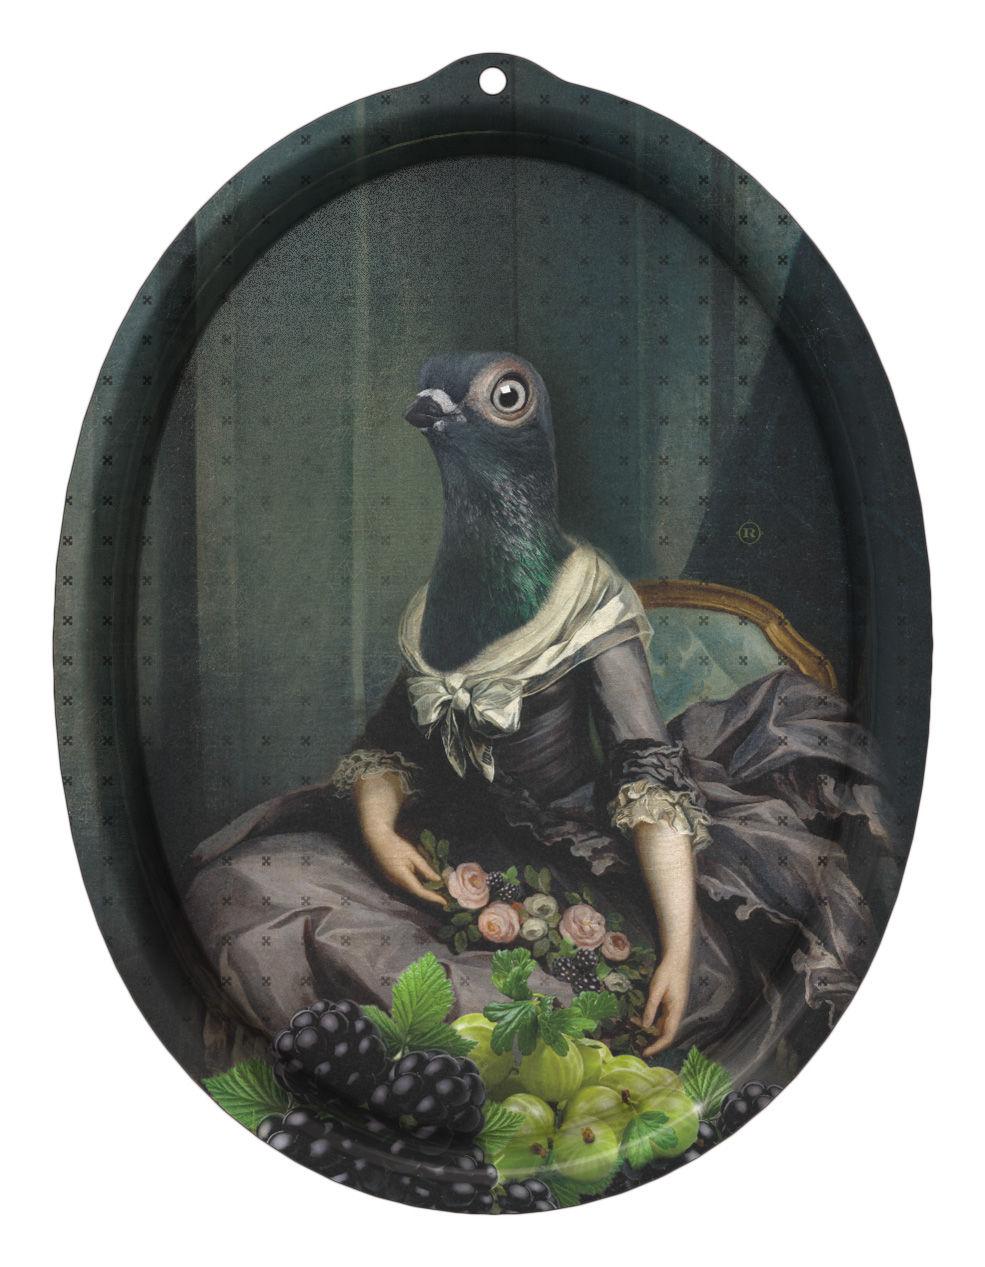 Tavola - Vassoi  - Piano/vassoio Le Boudoir - Isild - Cornice di Ibride - Isild / Toni del grigio-blu - Laminato massello